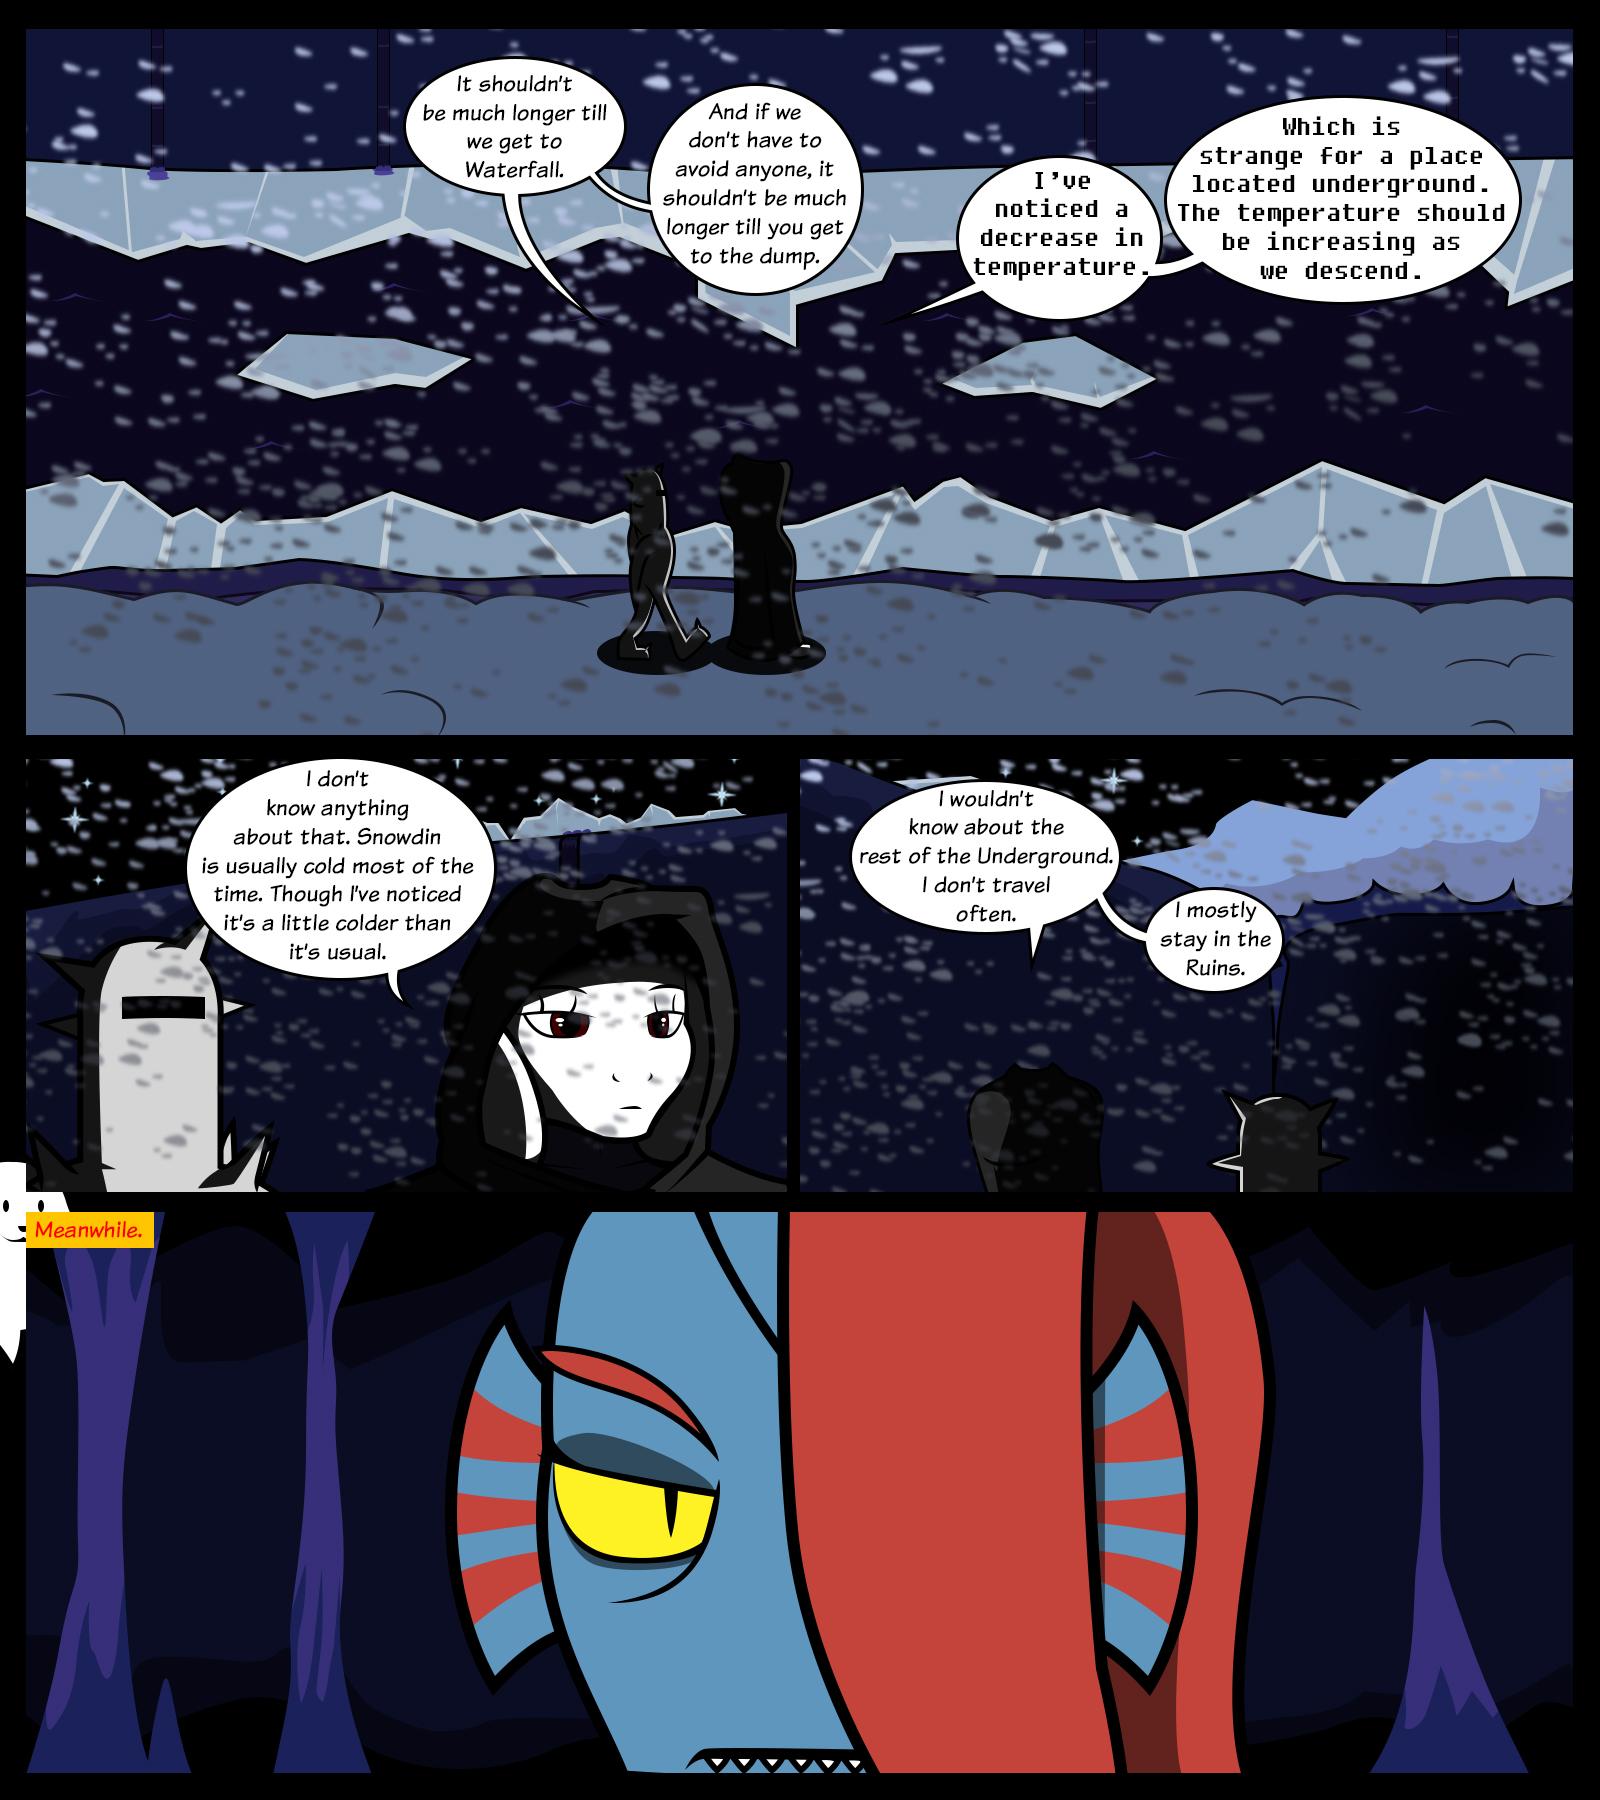 Undertale Deluxe: A Starman Adventure 31 by GatesMcCloud